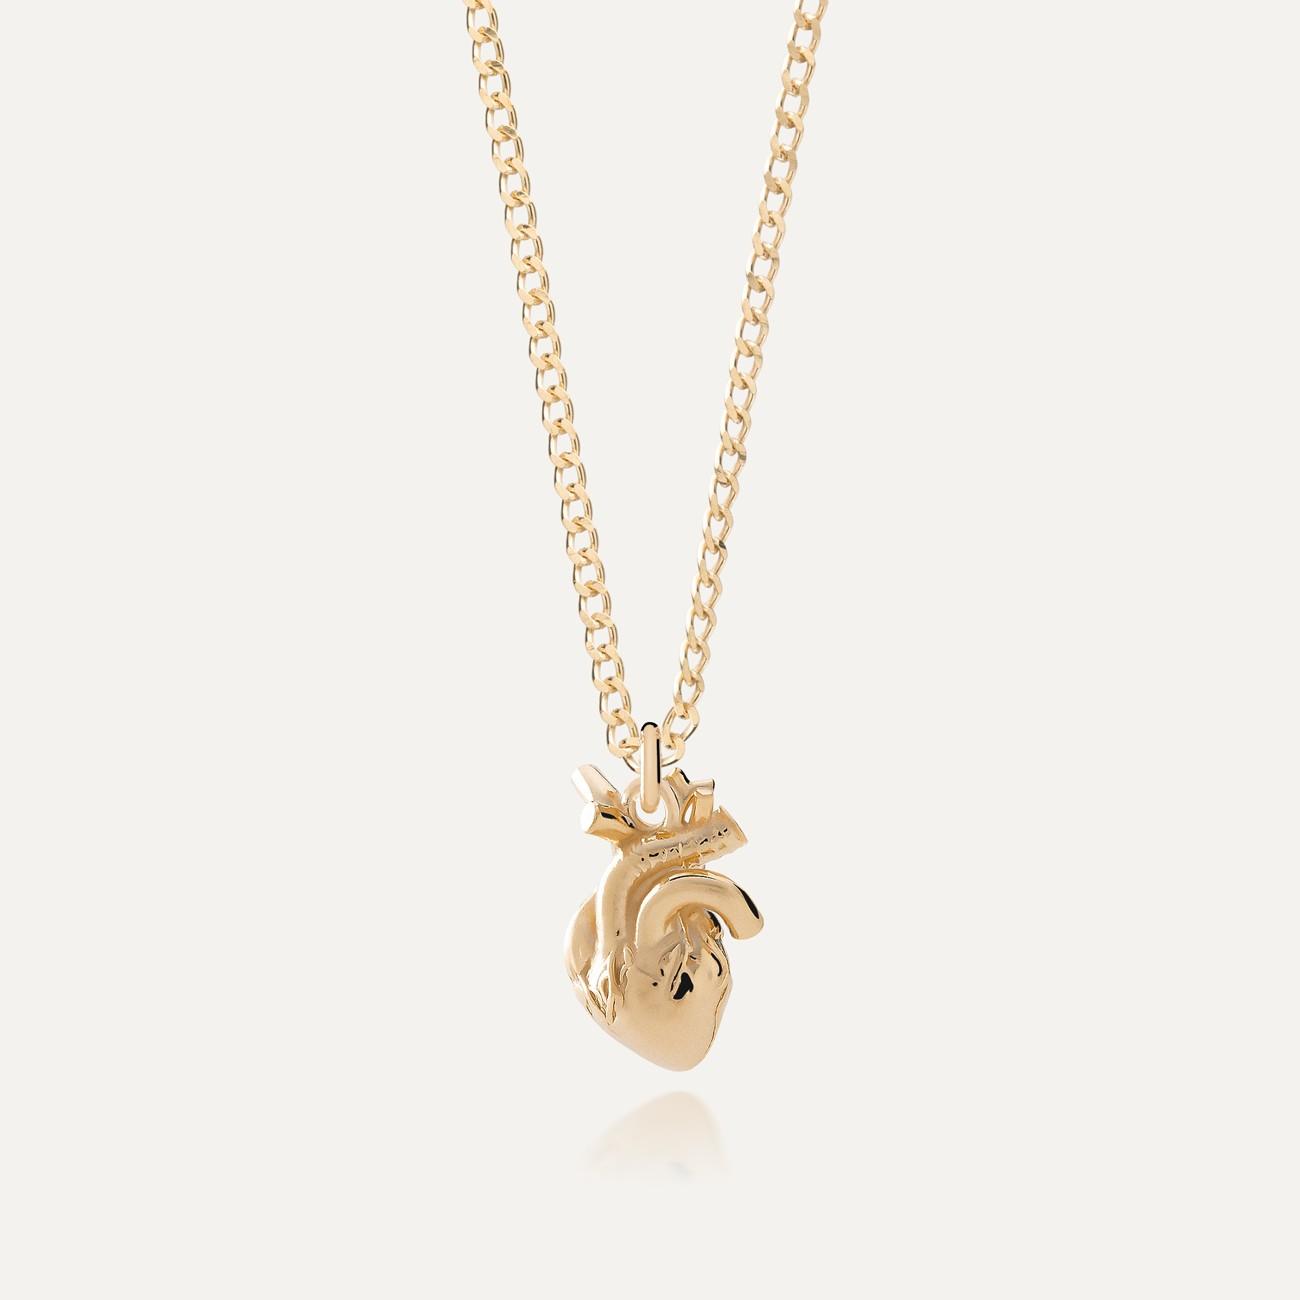 Srebrny naszyjnik serce anatomiczne, srebro 925